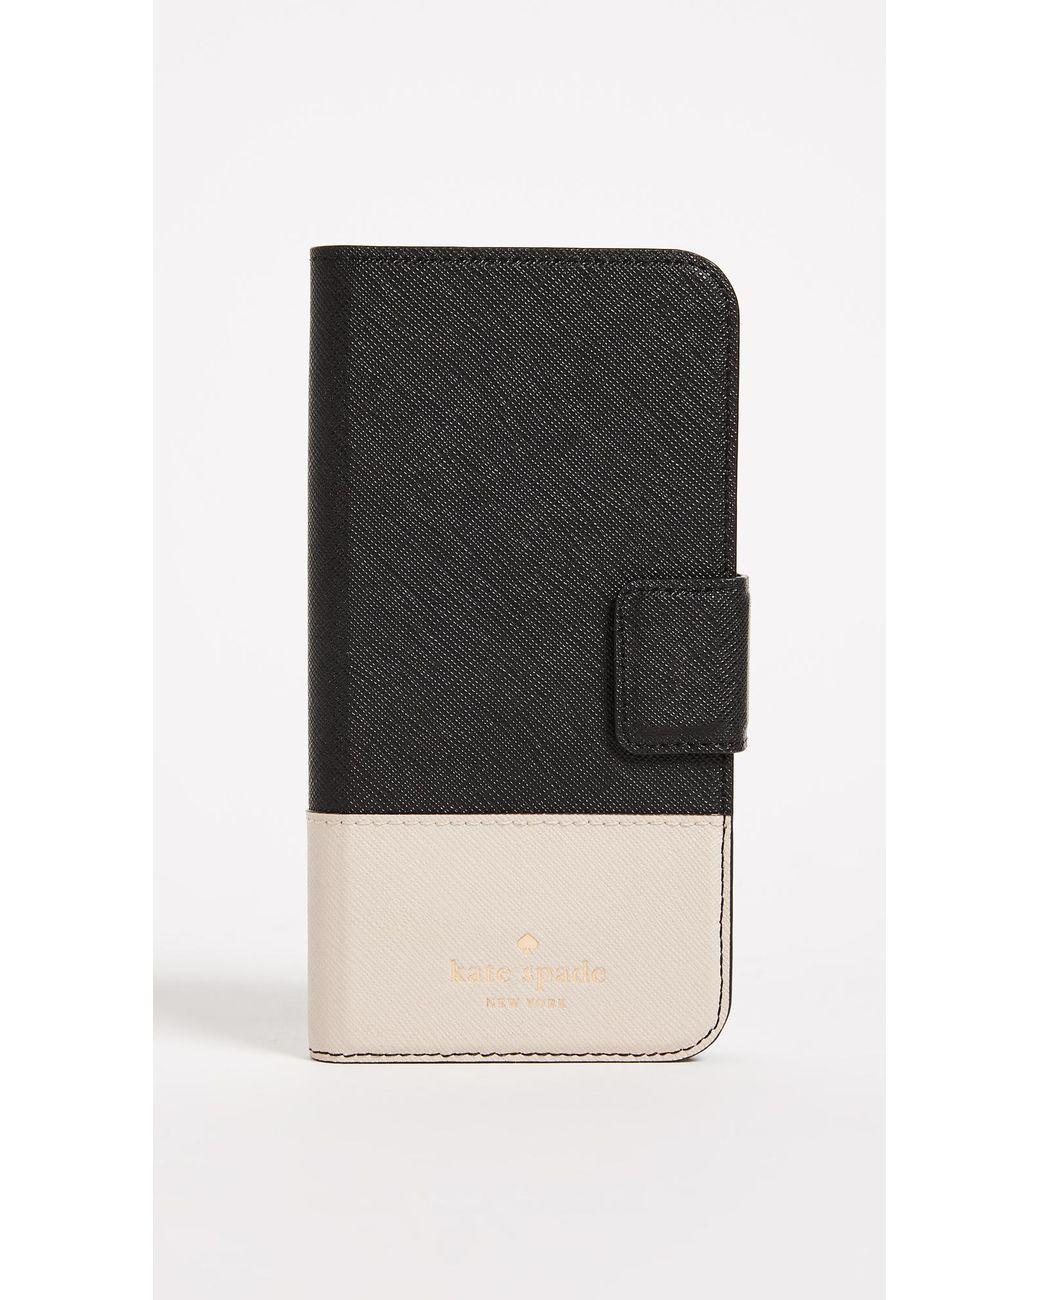 Kate spade black leather wrap folio iphone x xs case